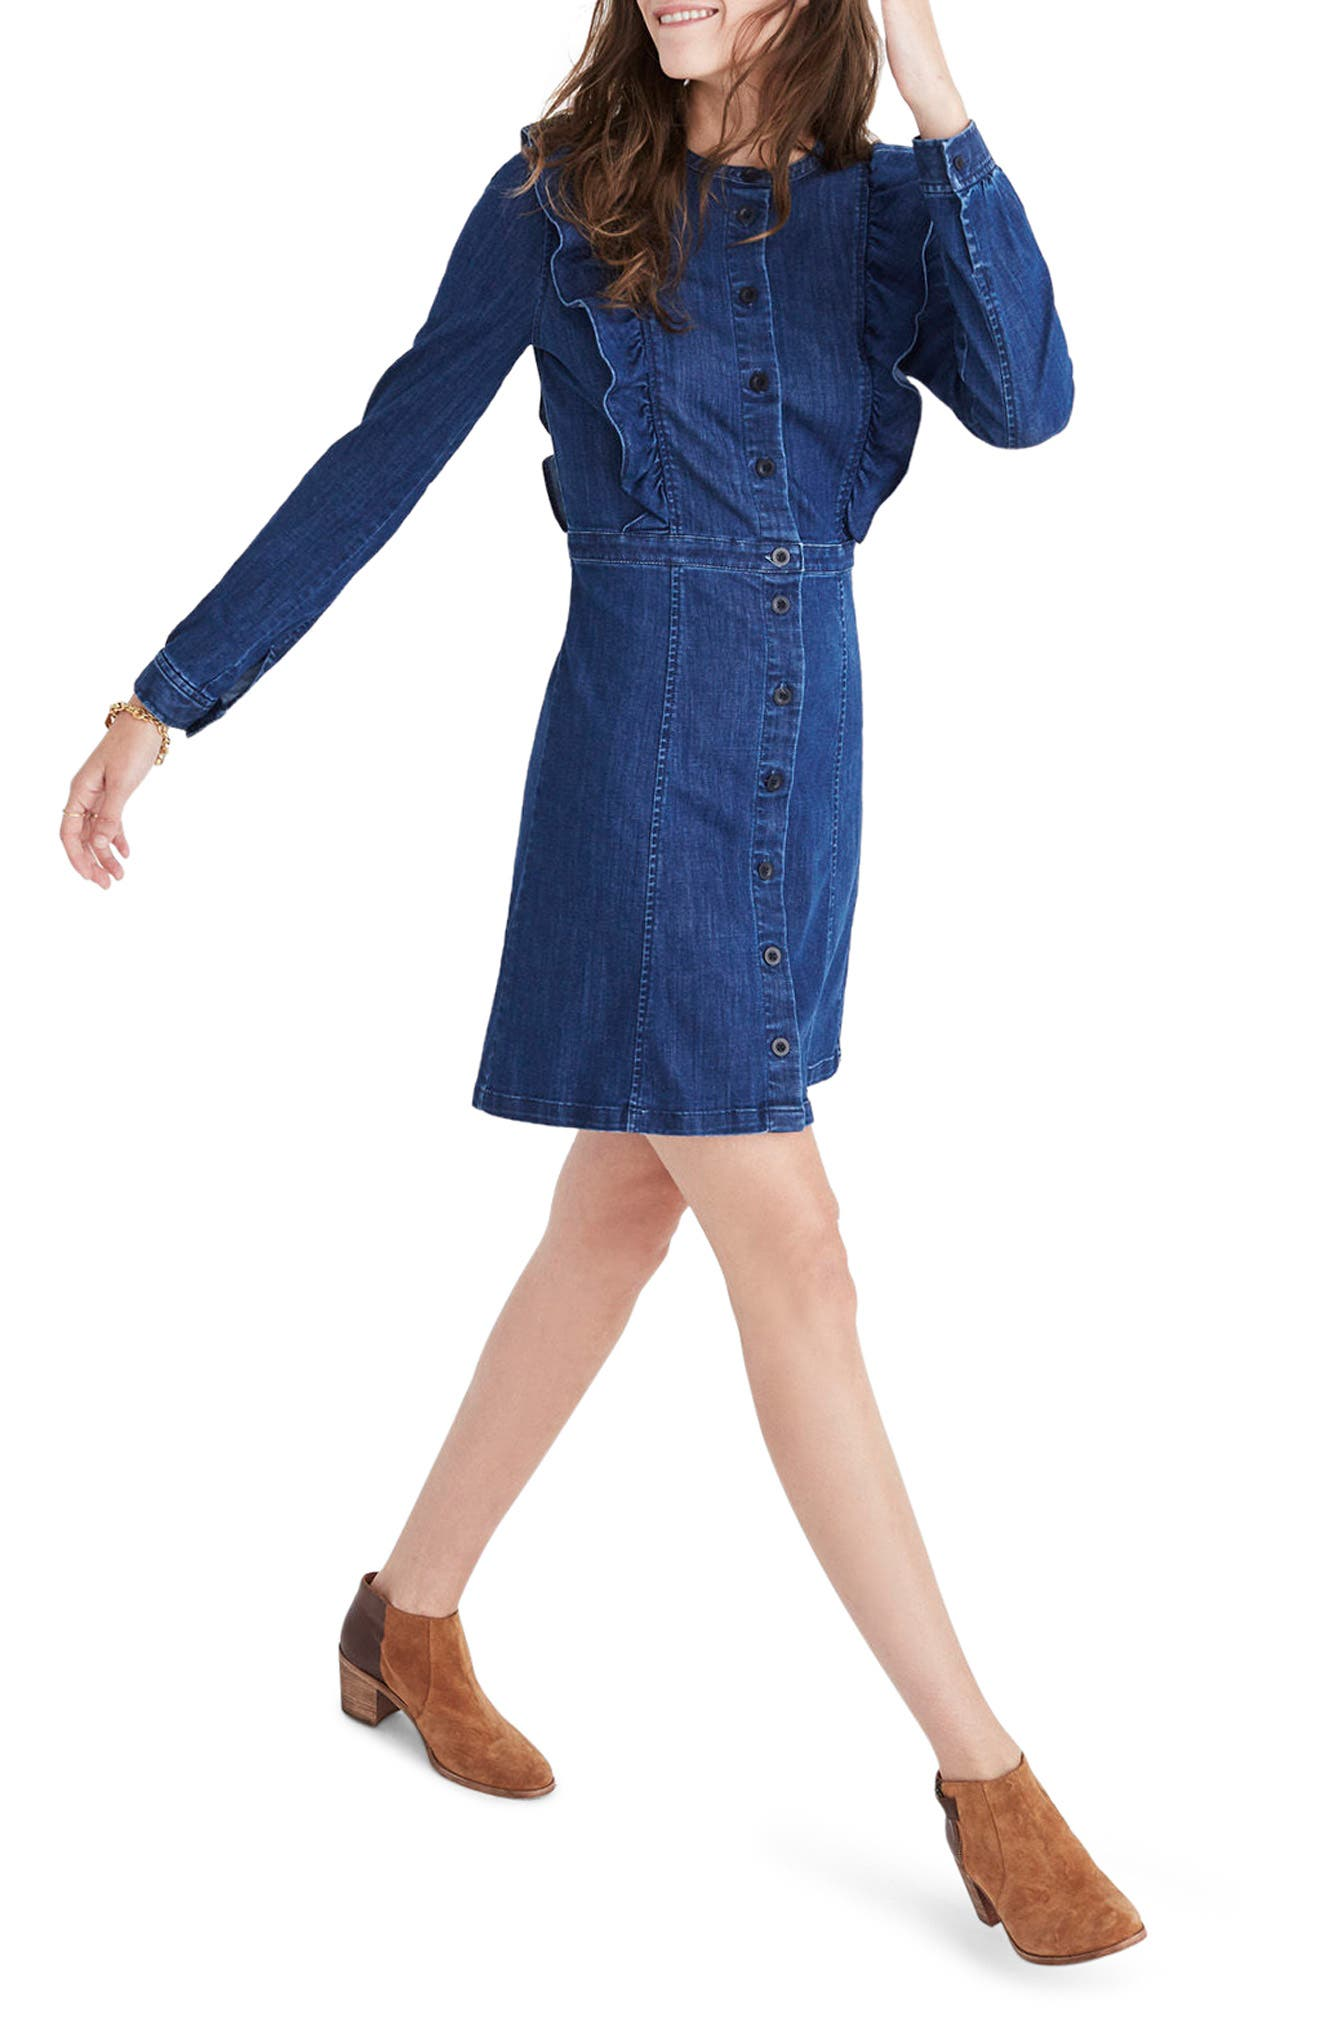 Madewell Ruffle Denim Dress